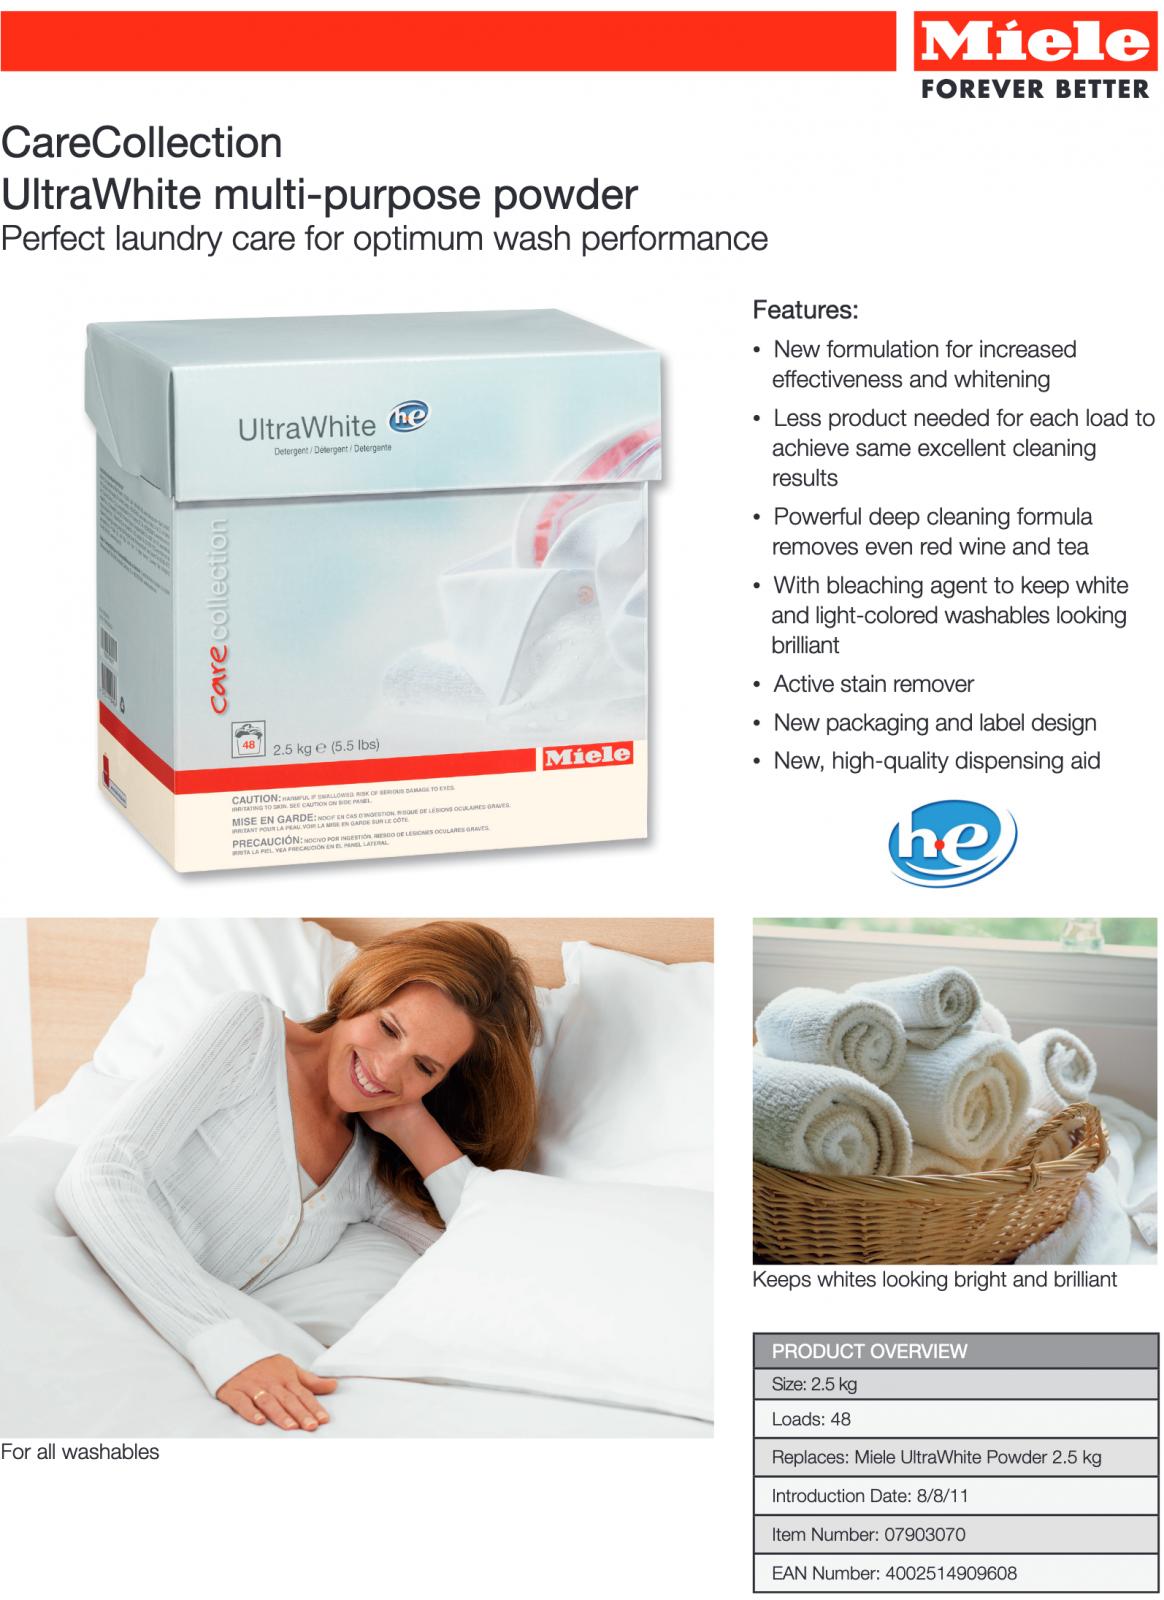 CareCollection UltraWhite multi-purpose powderPerfect laundry care for optimum wash performance